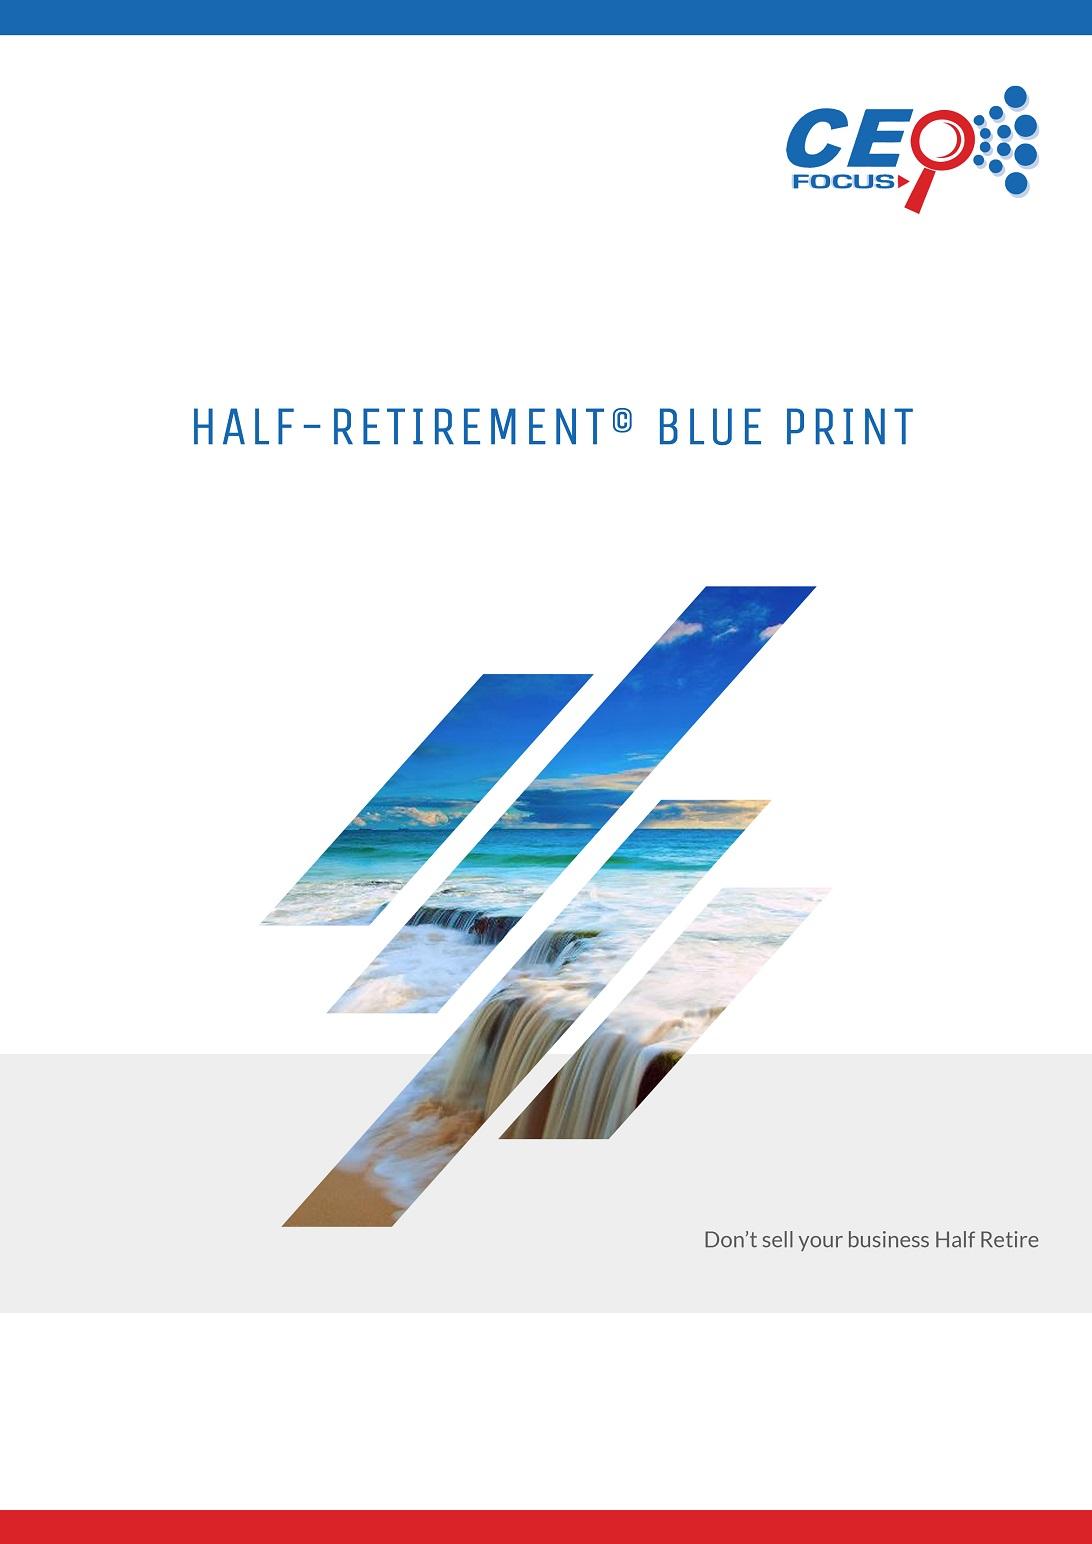 What is half retirement half retire download the half retire blueprint malvernweather Image collections